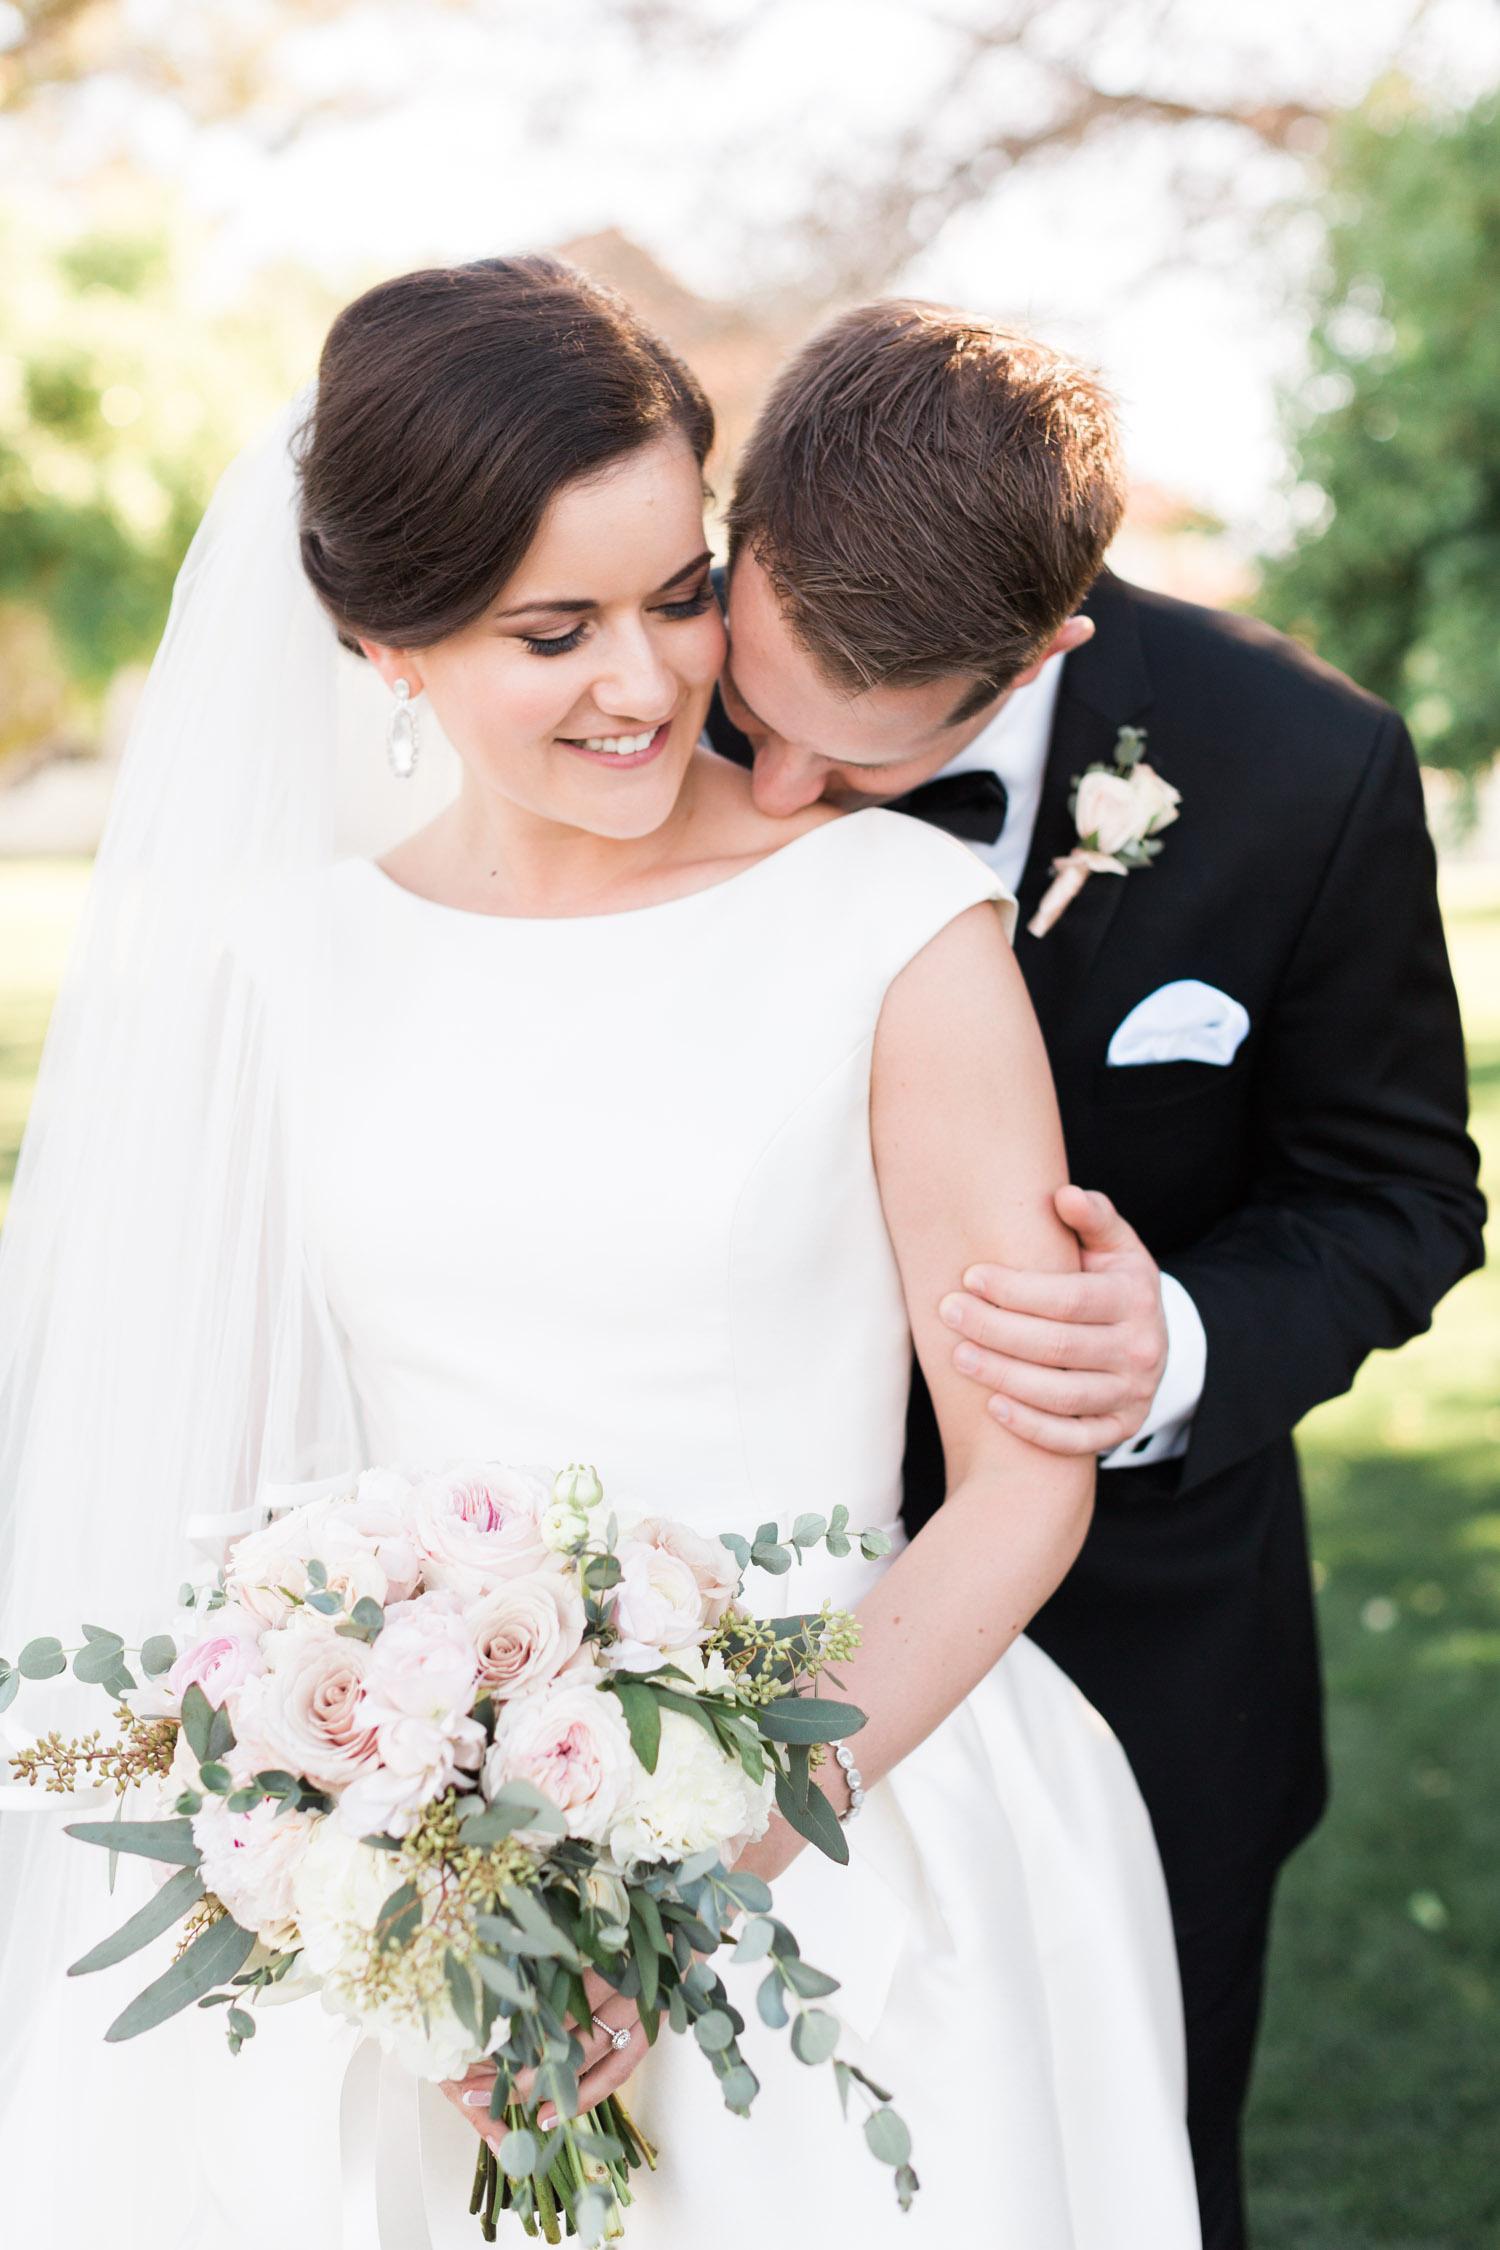 Groom kissing bride on shoulder| Betsy & John Photography | Tucson Wedding Photographers